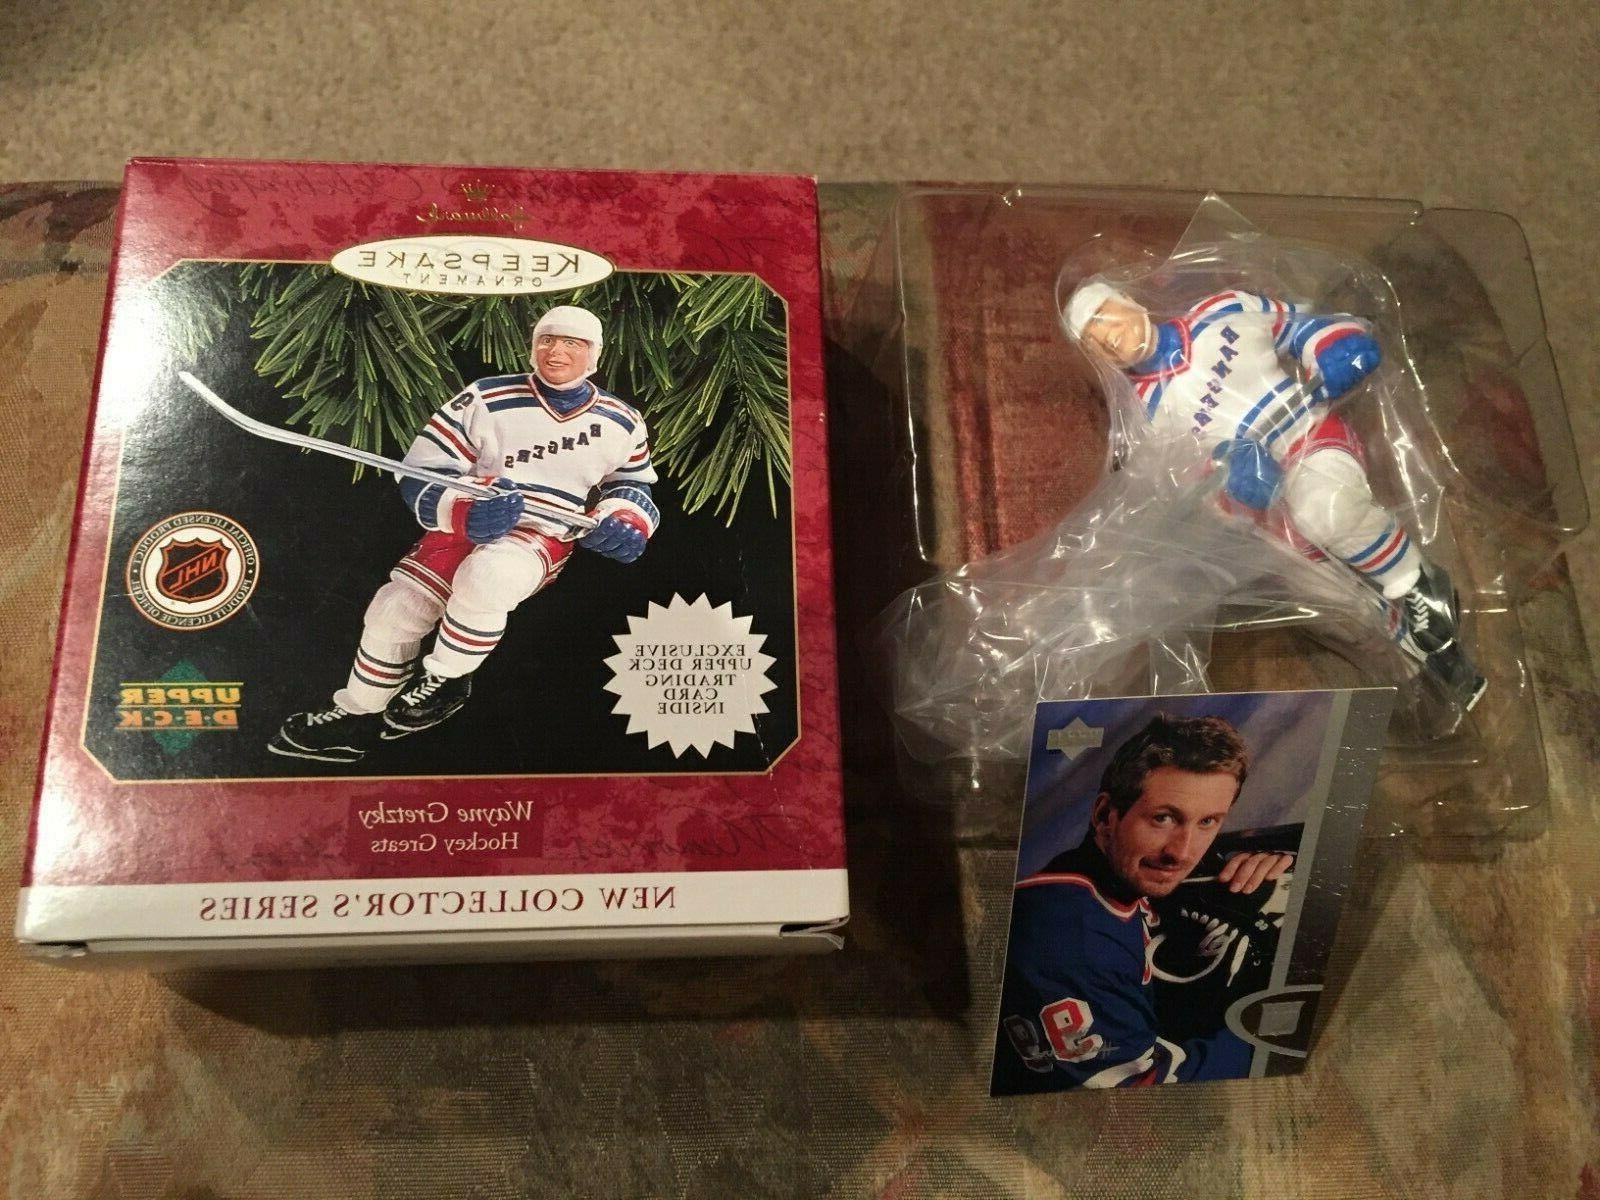 1997 wayne gretzky hockey hallmark keepsake ornament